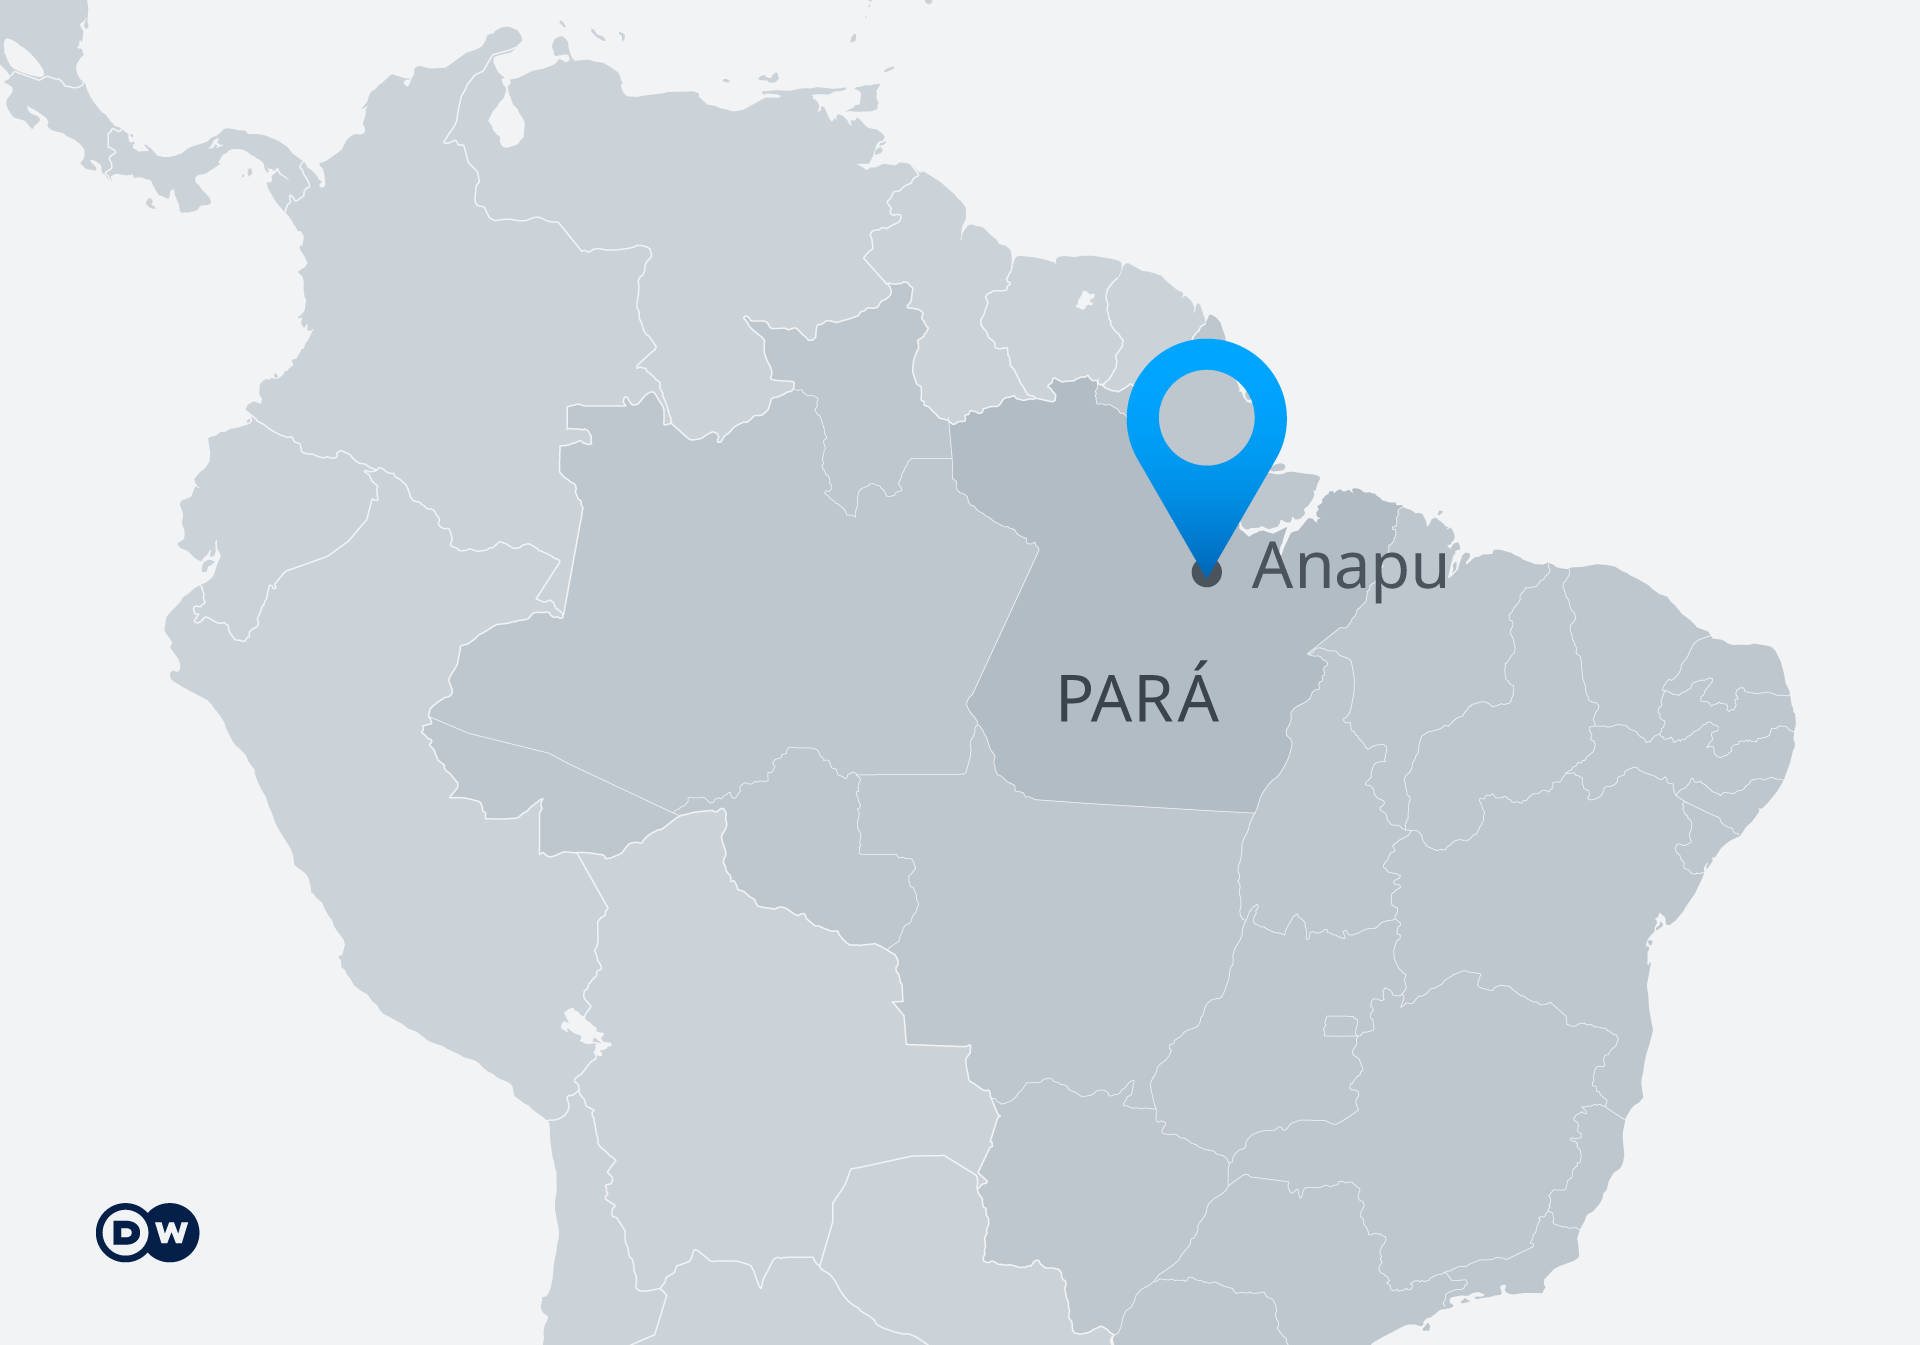 Anapu, Pará